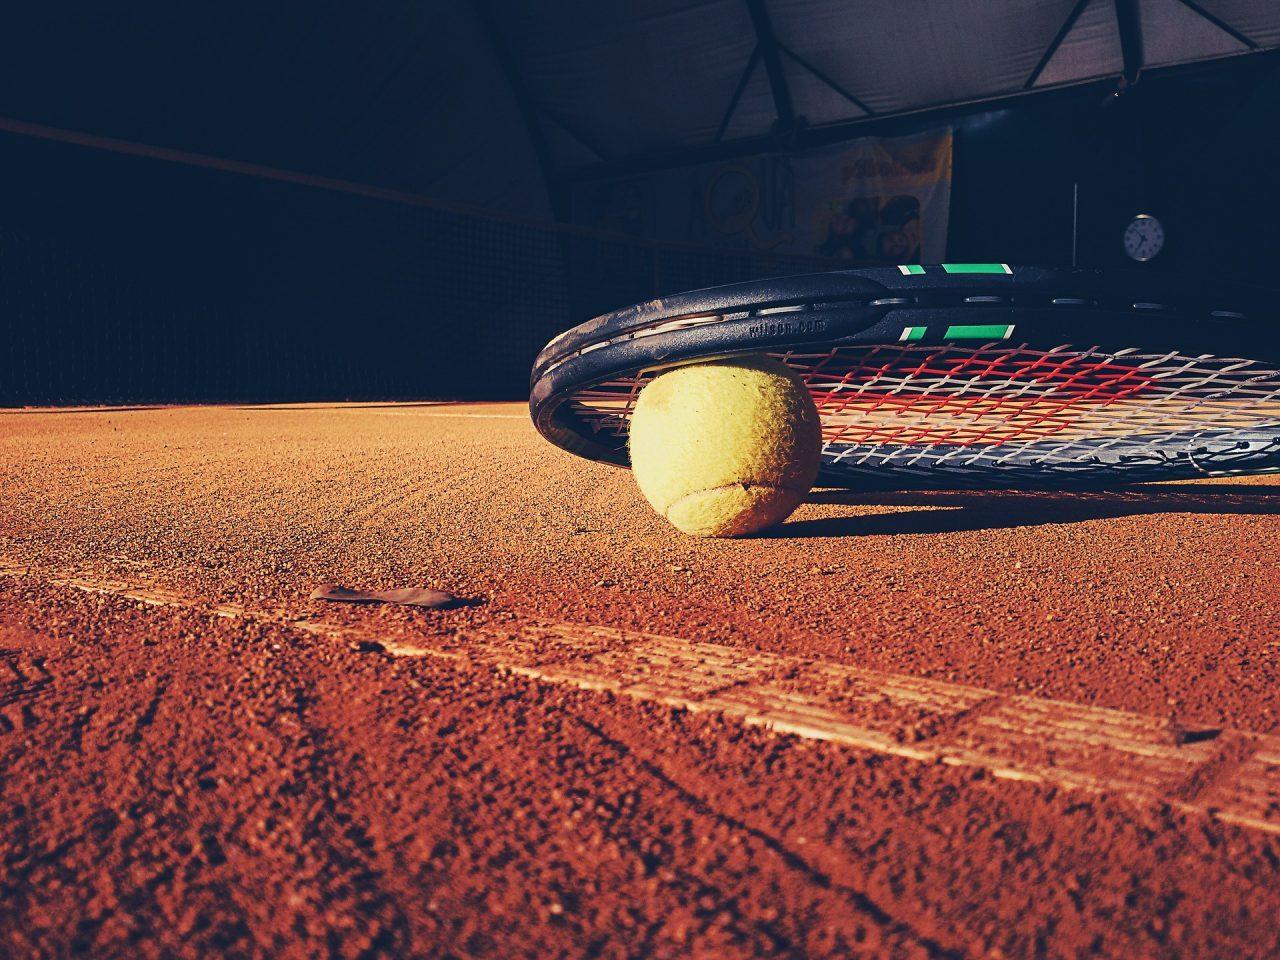 tennis-grus-1280x960.jpg